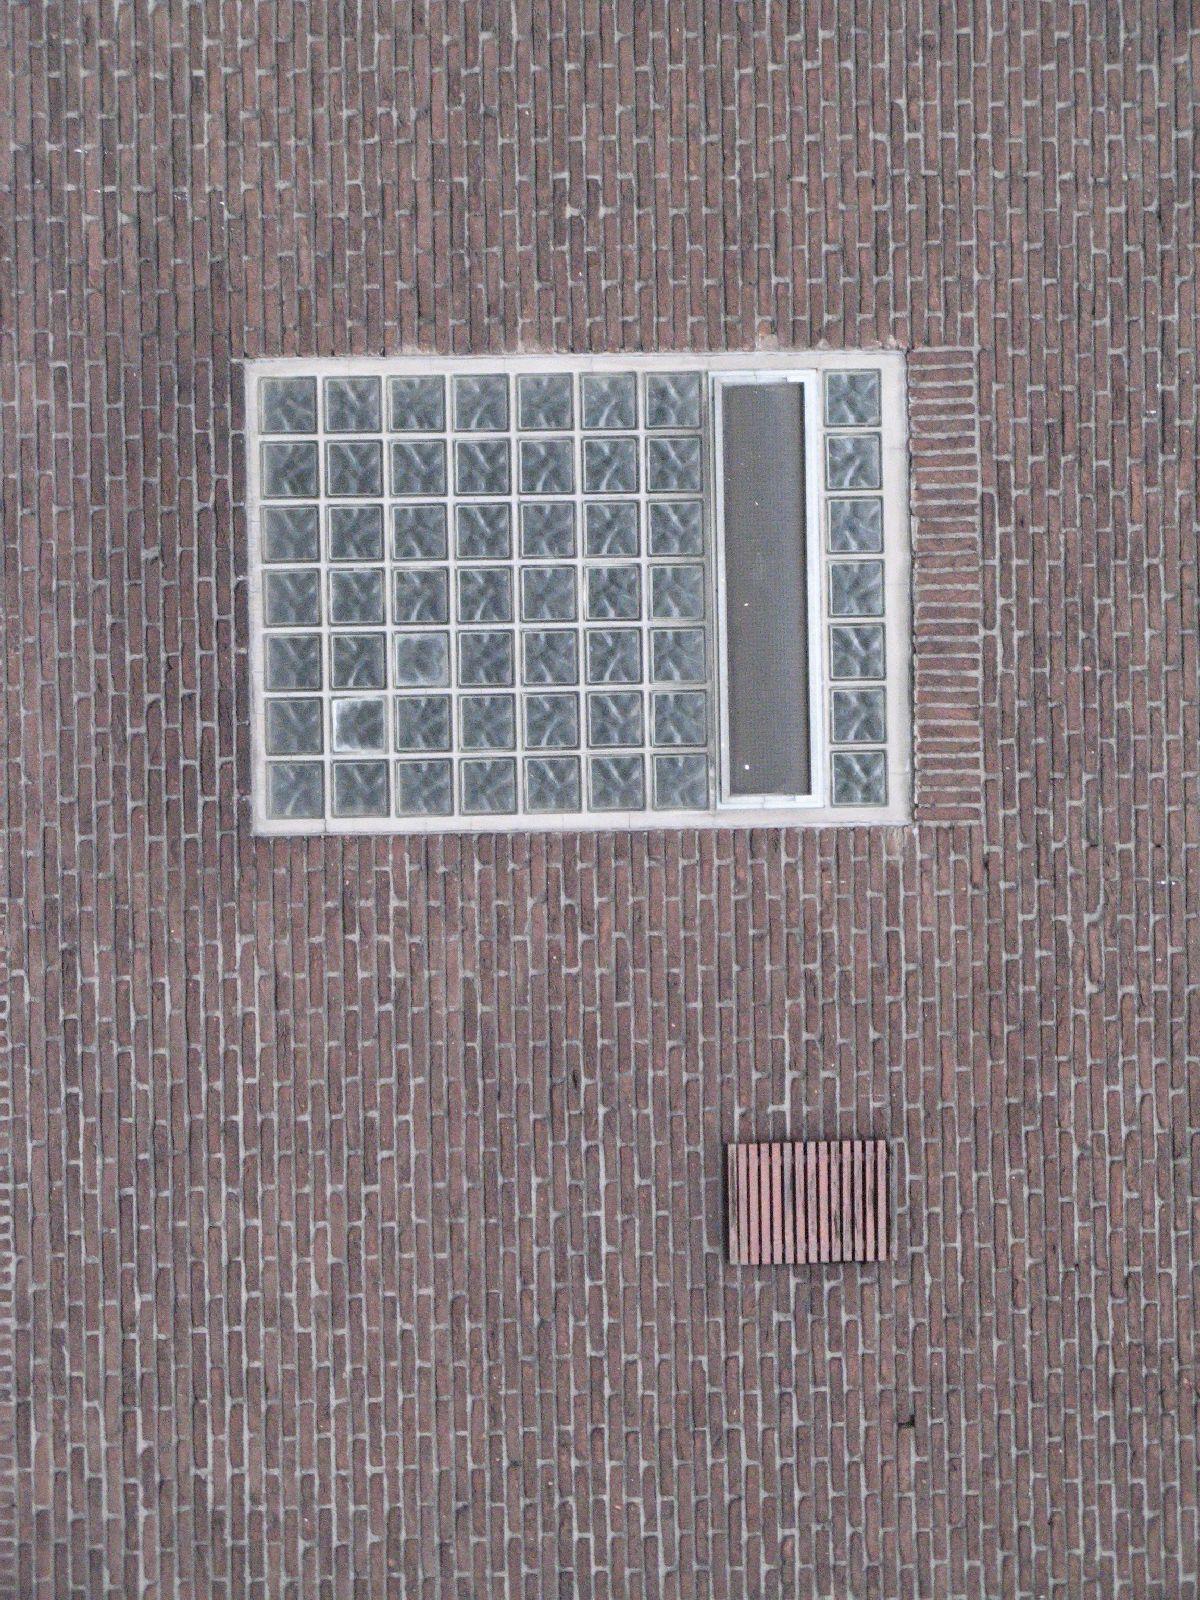 Building_Texture_B_3996